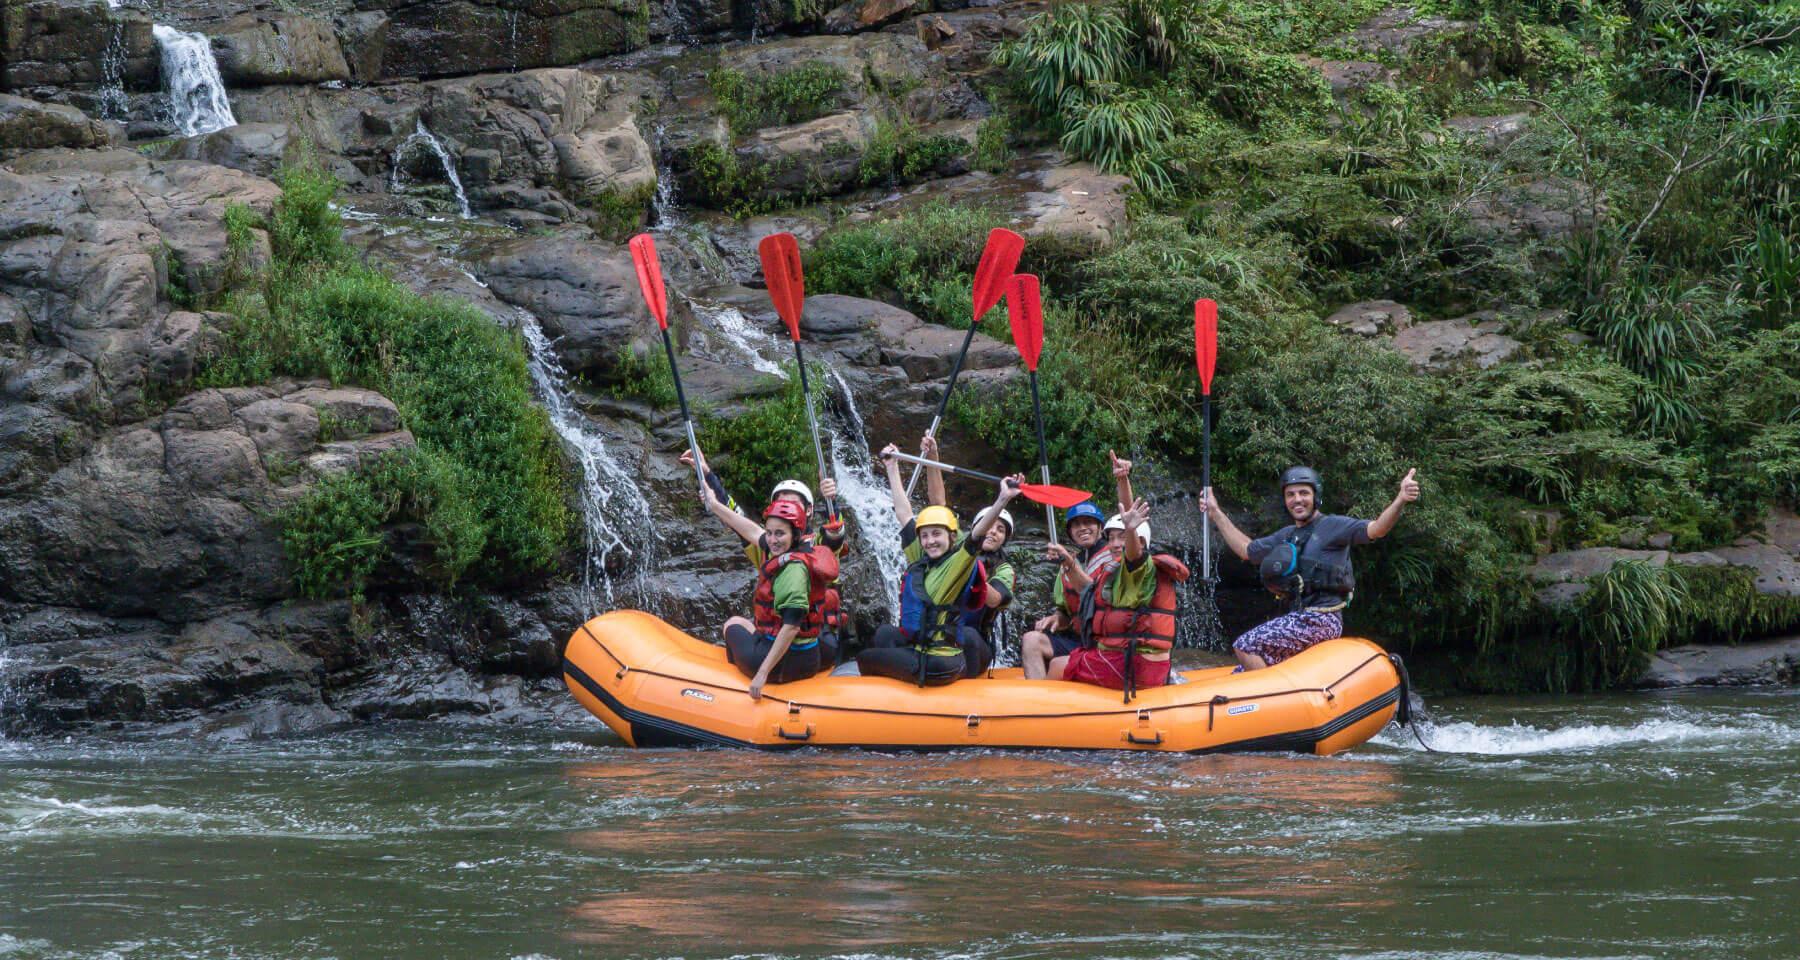 Rafting trip, 2 days in Napo, Tena. Ecuador in Southamerica